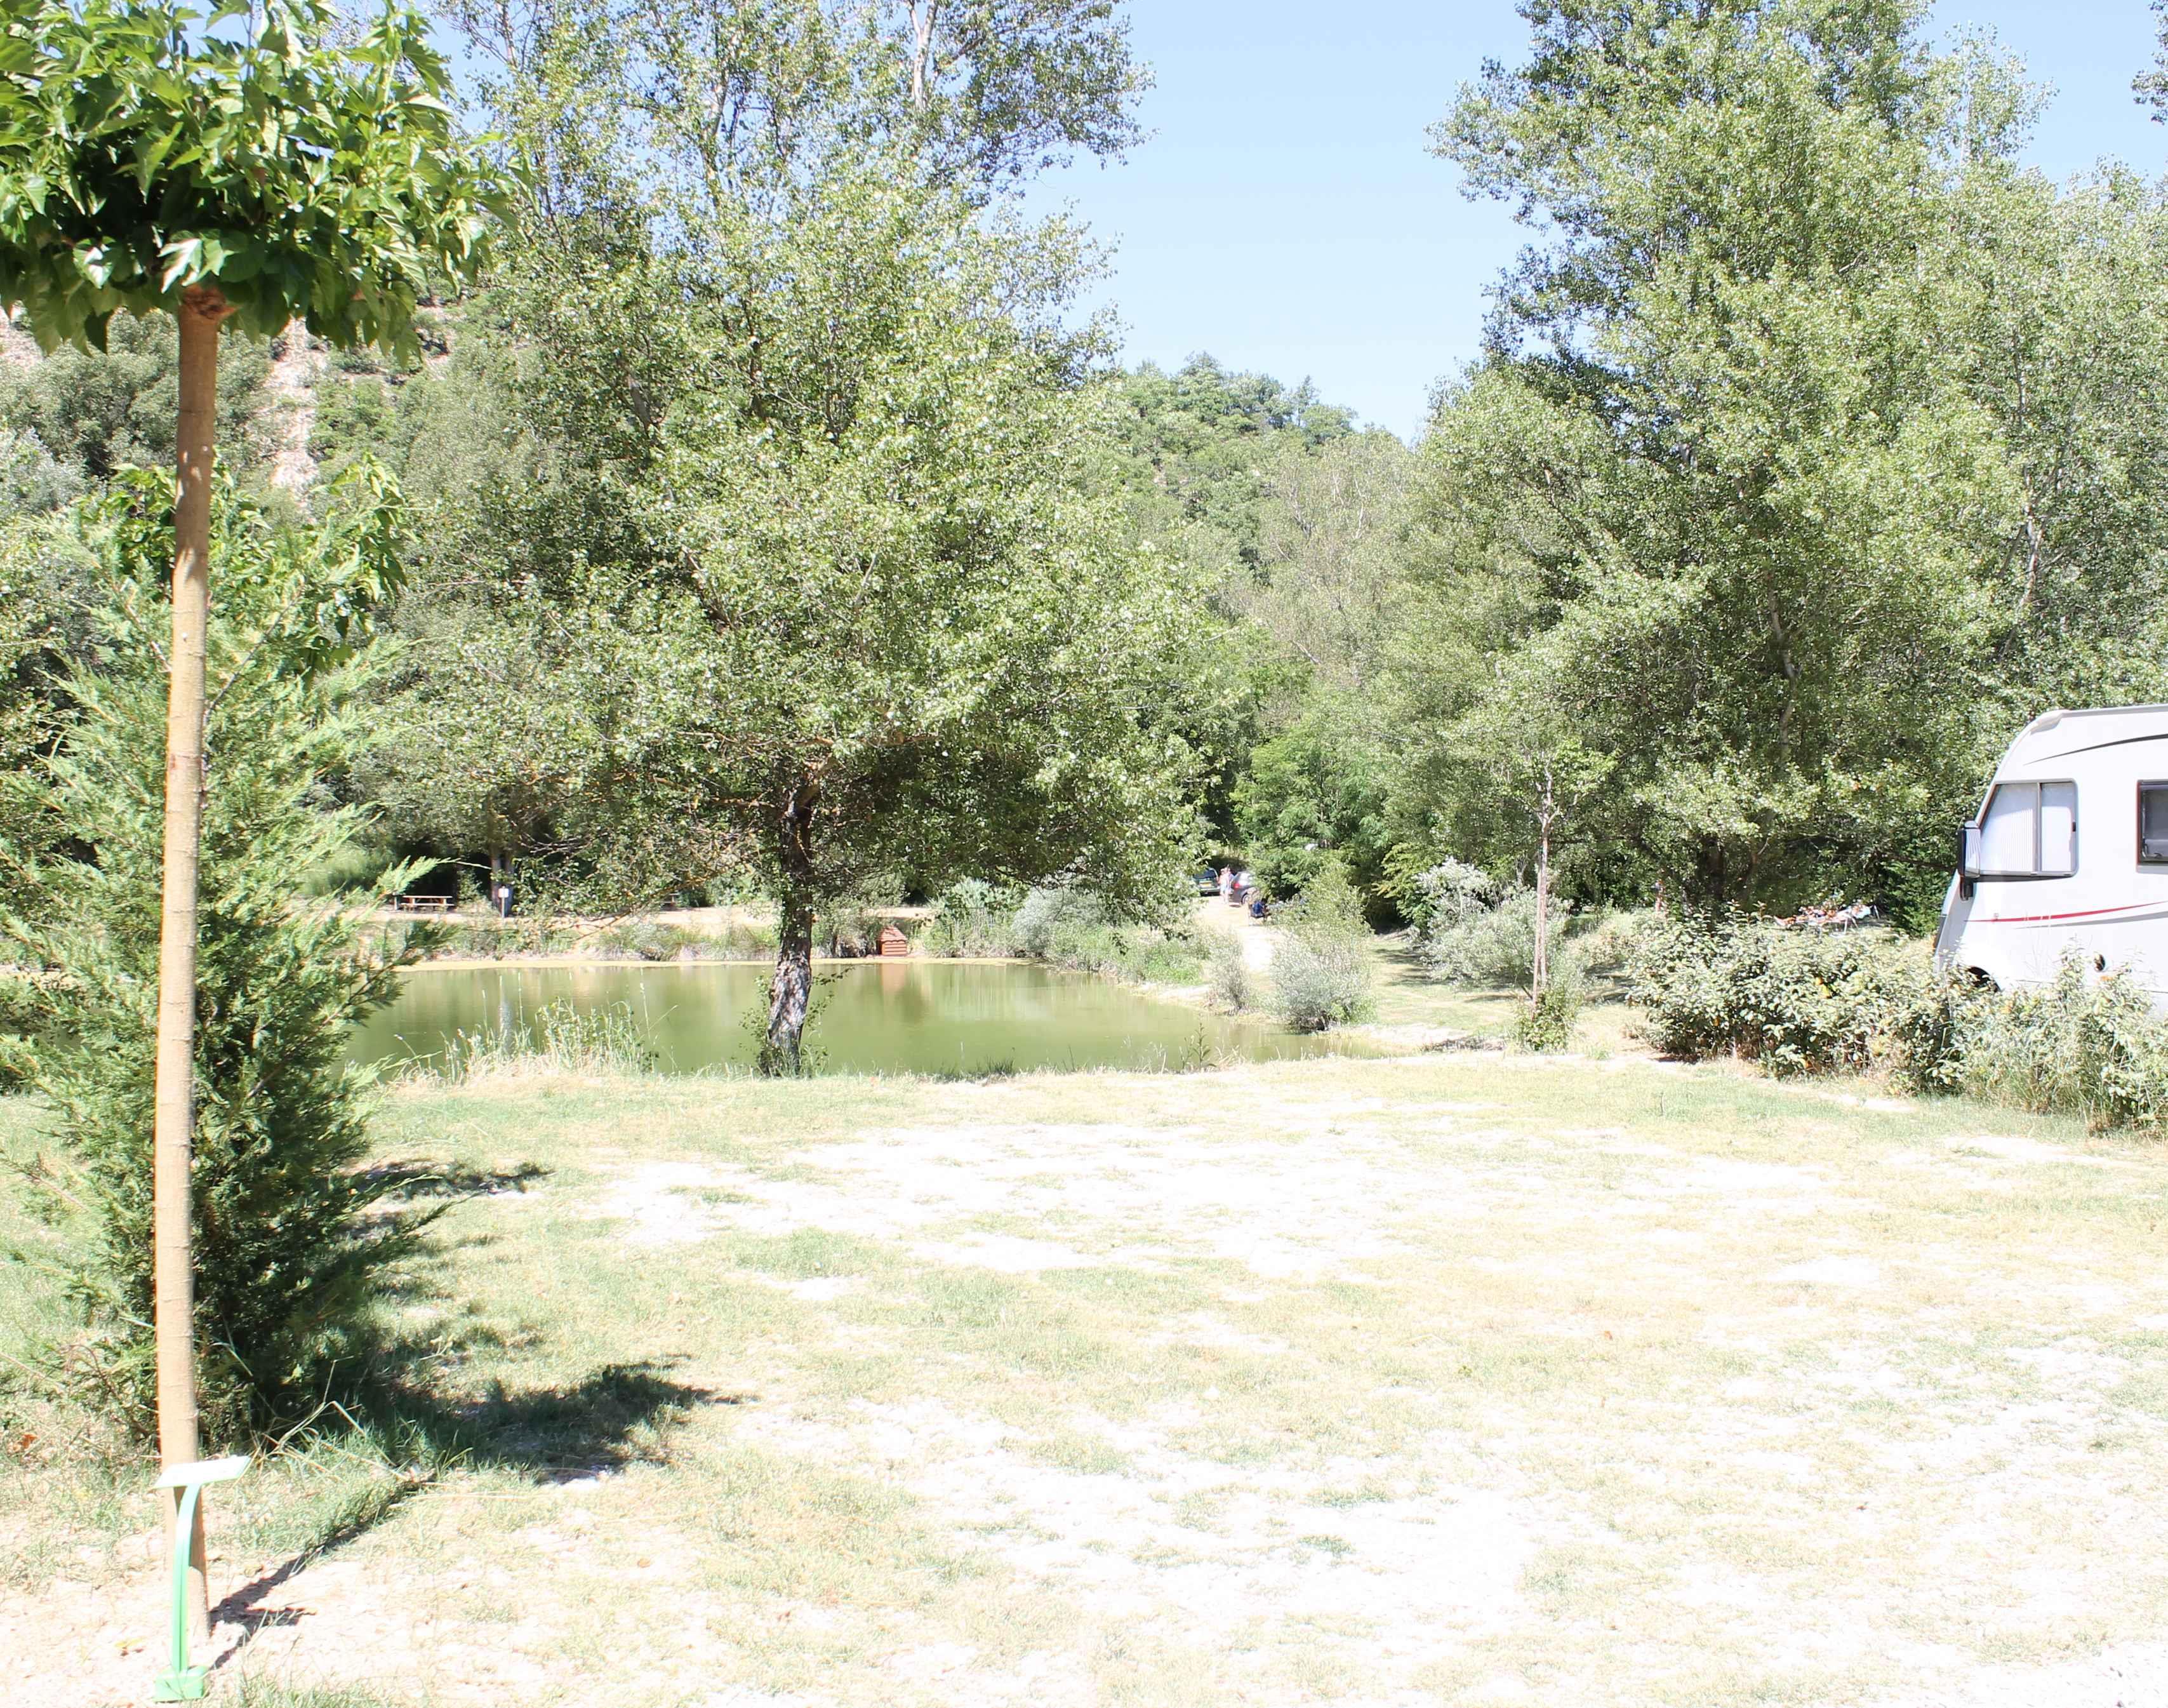 Emplacement - Forfait Nature (1 Tente, Caravane Ou Camping-Car / 1 Voiture) - Flower Camping La Riviere